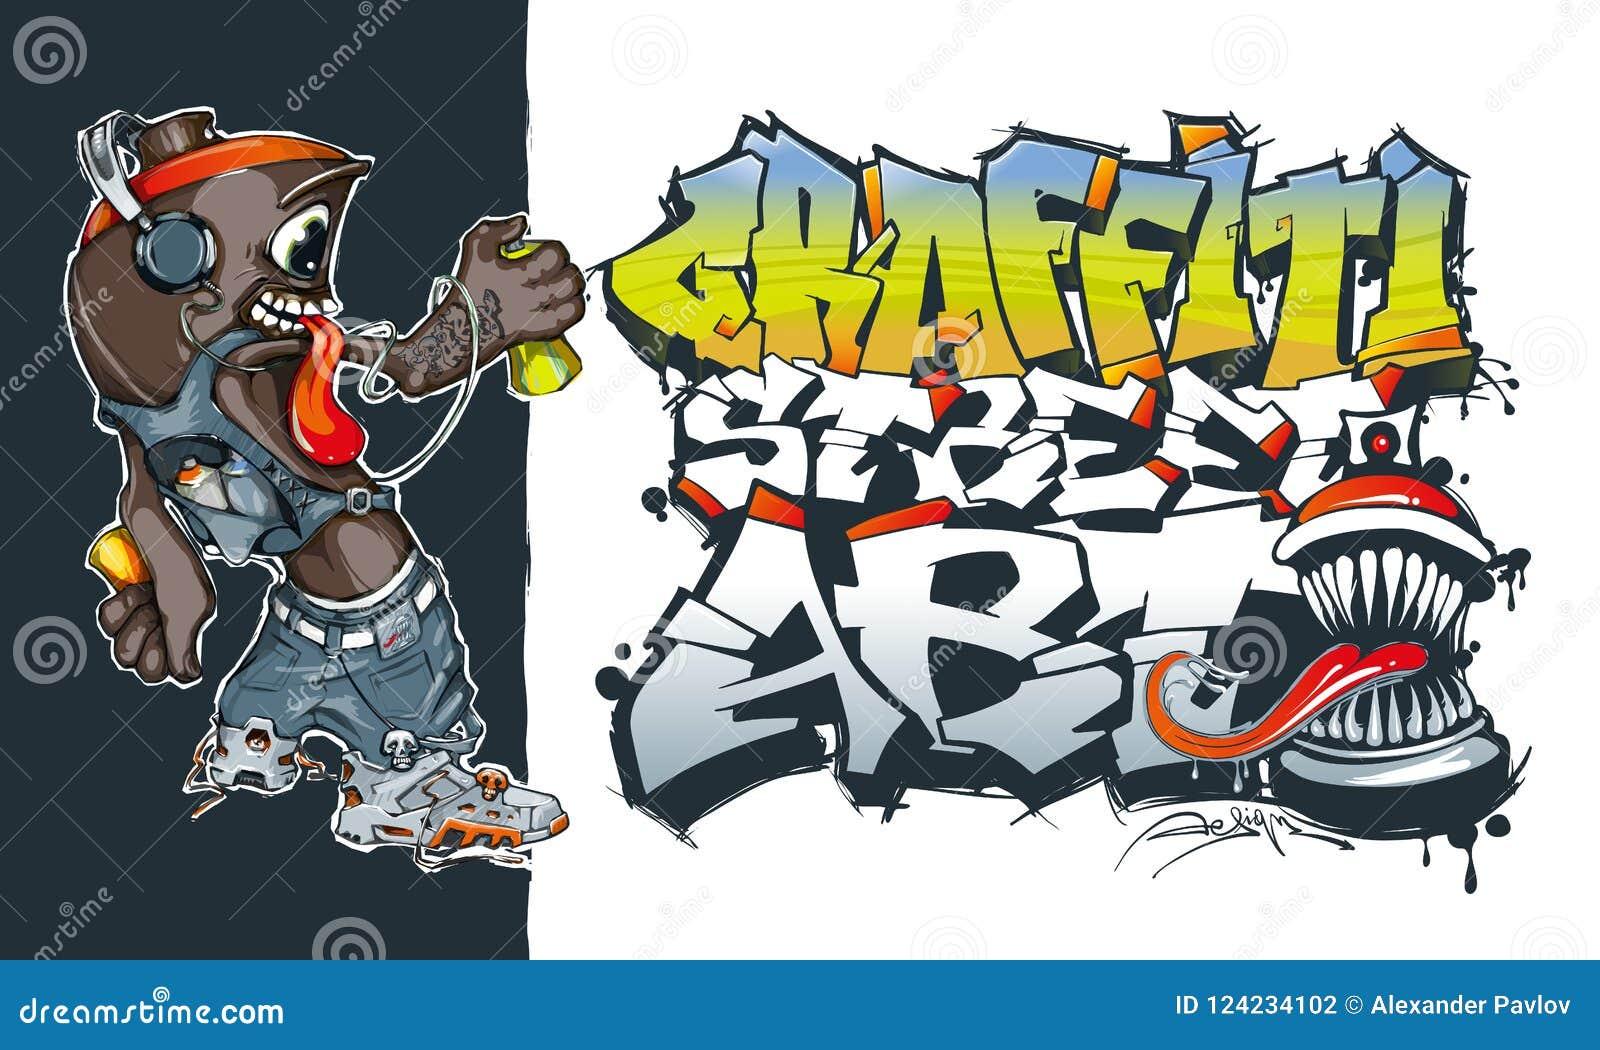 aerosol graffiti paint spray street art concept graffiti spray